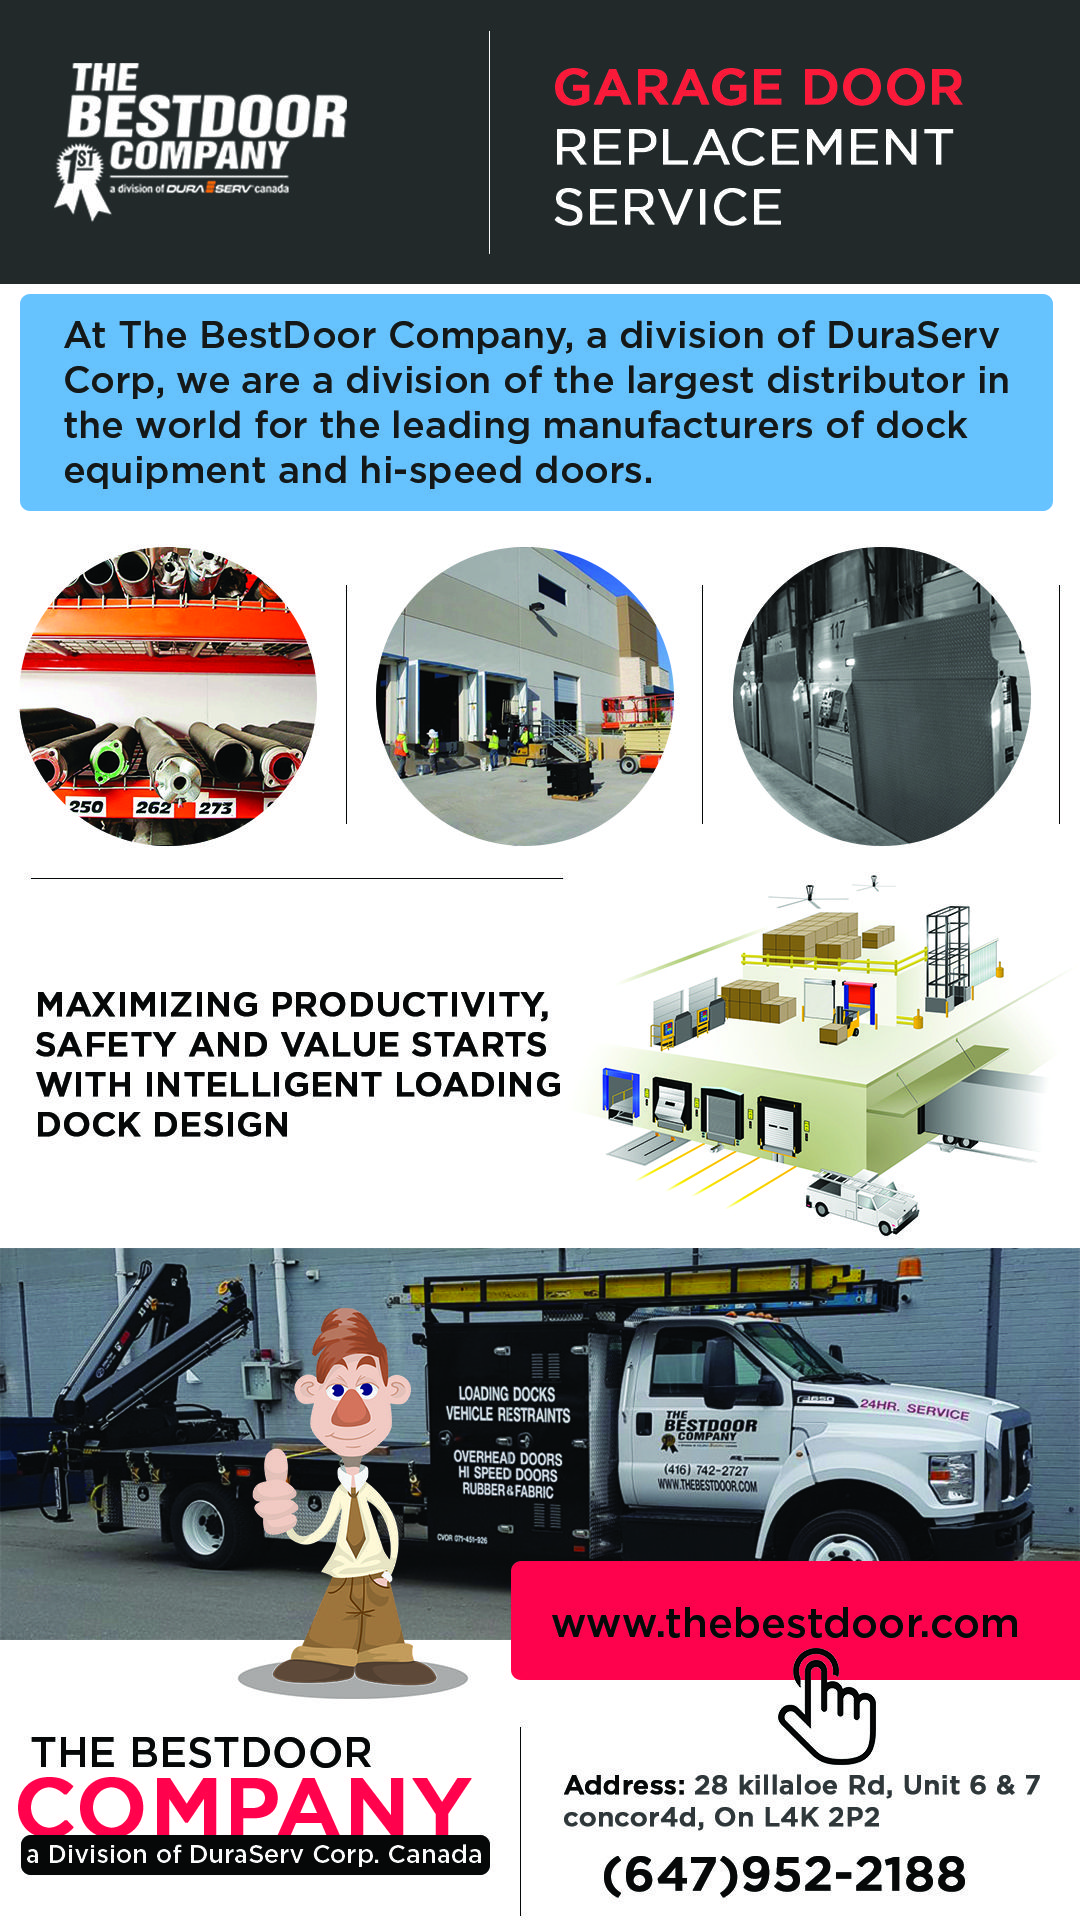 Thebestdoor One Of The Best Company In Killaloe Rd Service